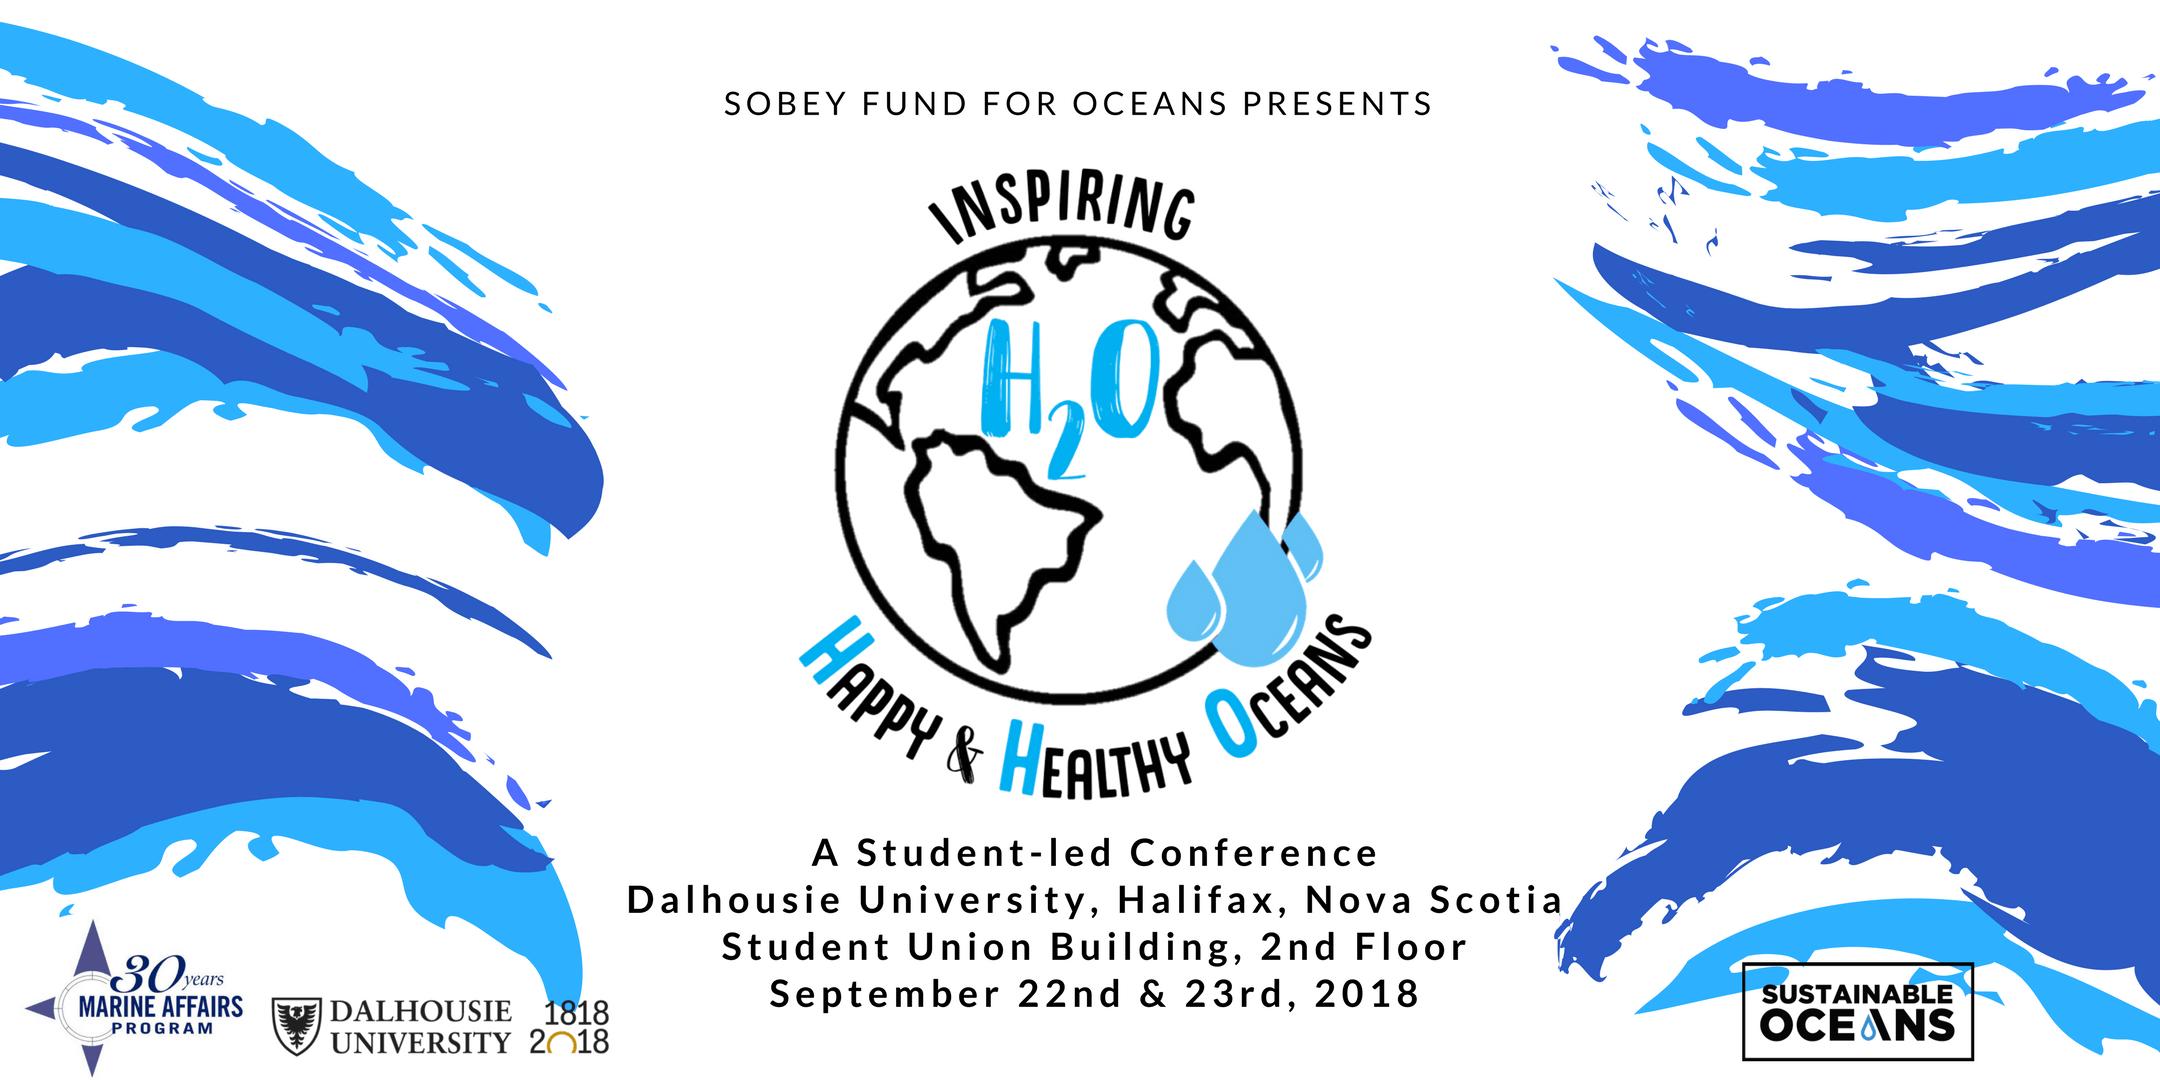 Saturday Conference - H2O: Inspiring Happy &